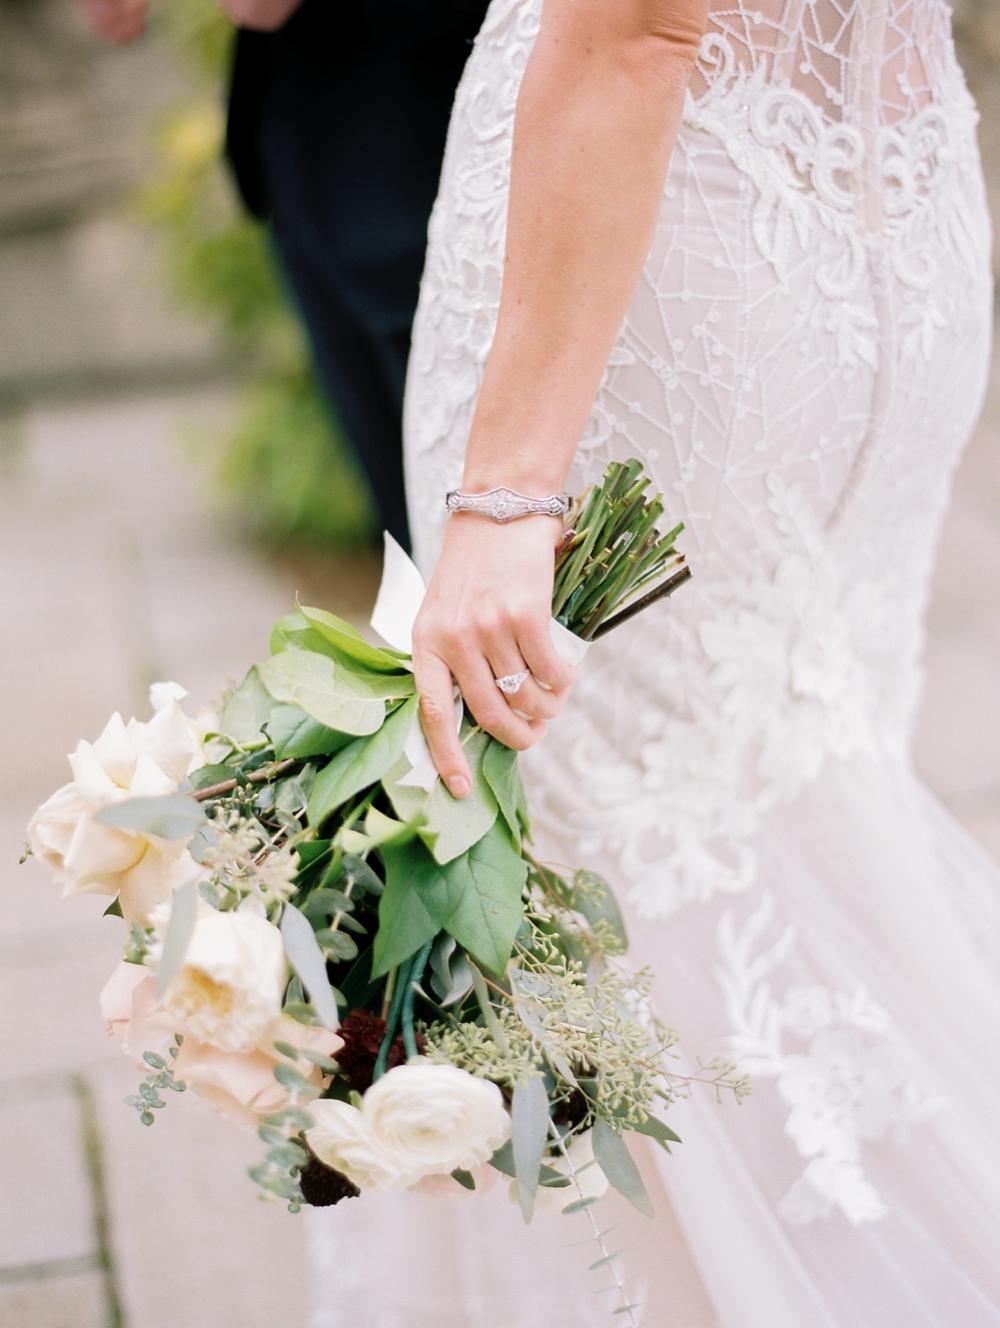 Kristin-La-Voie-Photography-CHICAGO-WEDDING-PHOTOGRAPHER-KOHLER-WHISTLING-STRAITS-17